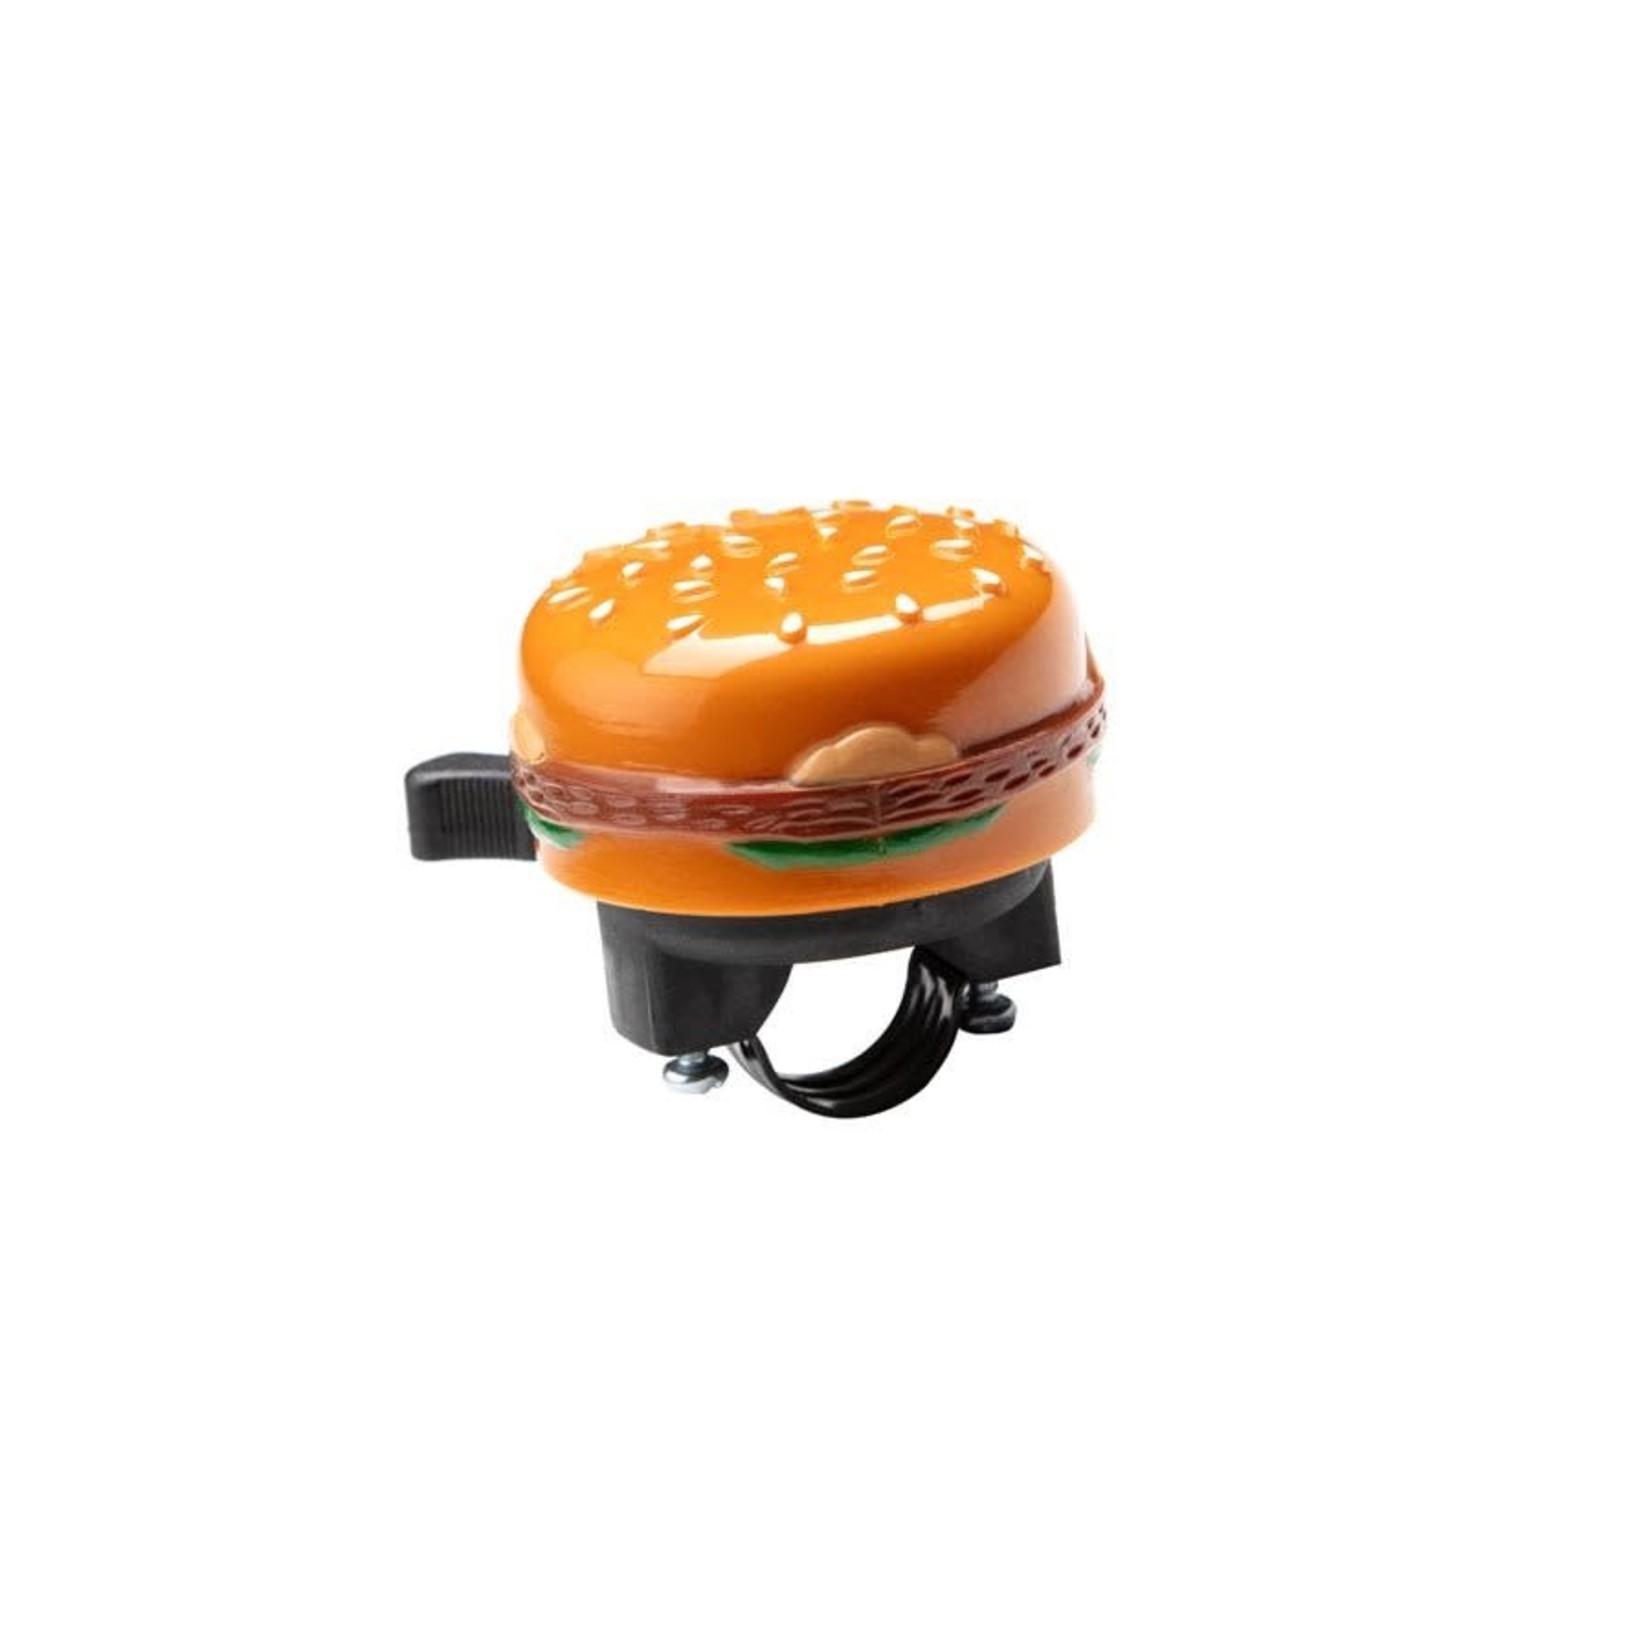 Evo Evo Burger Bell